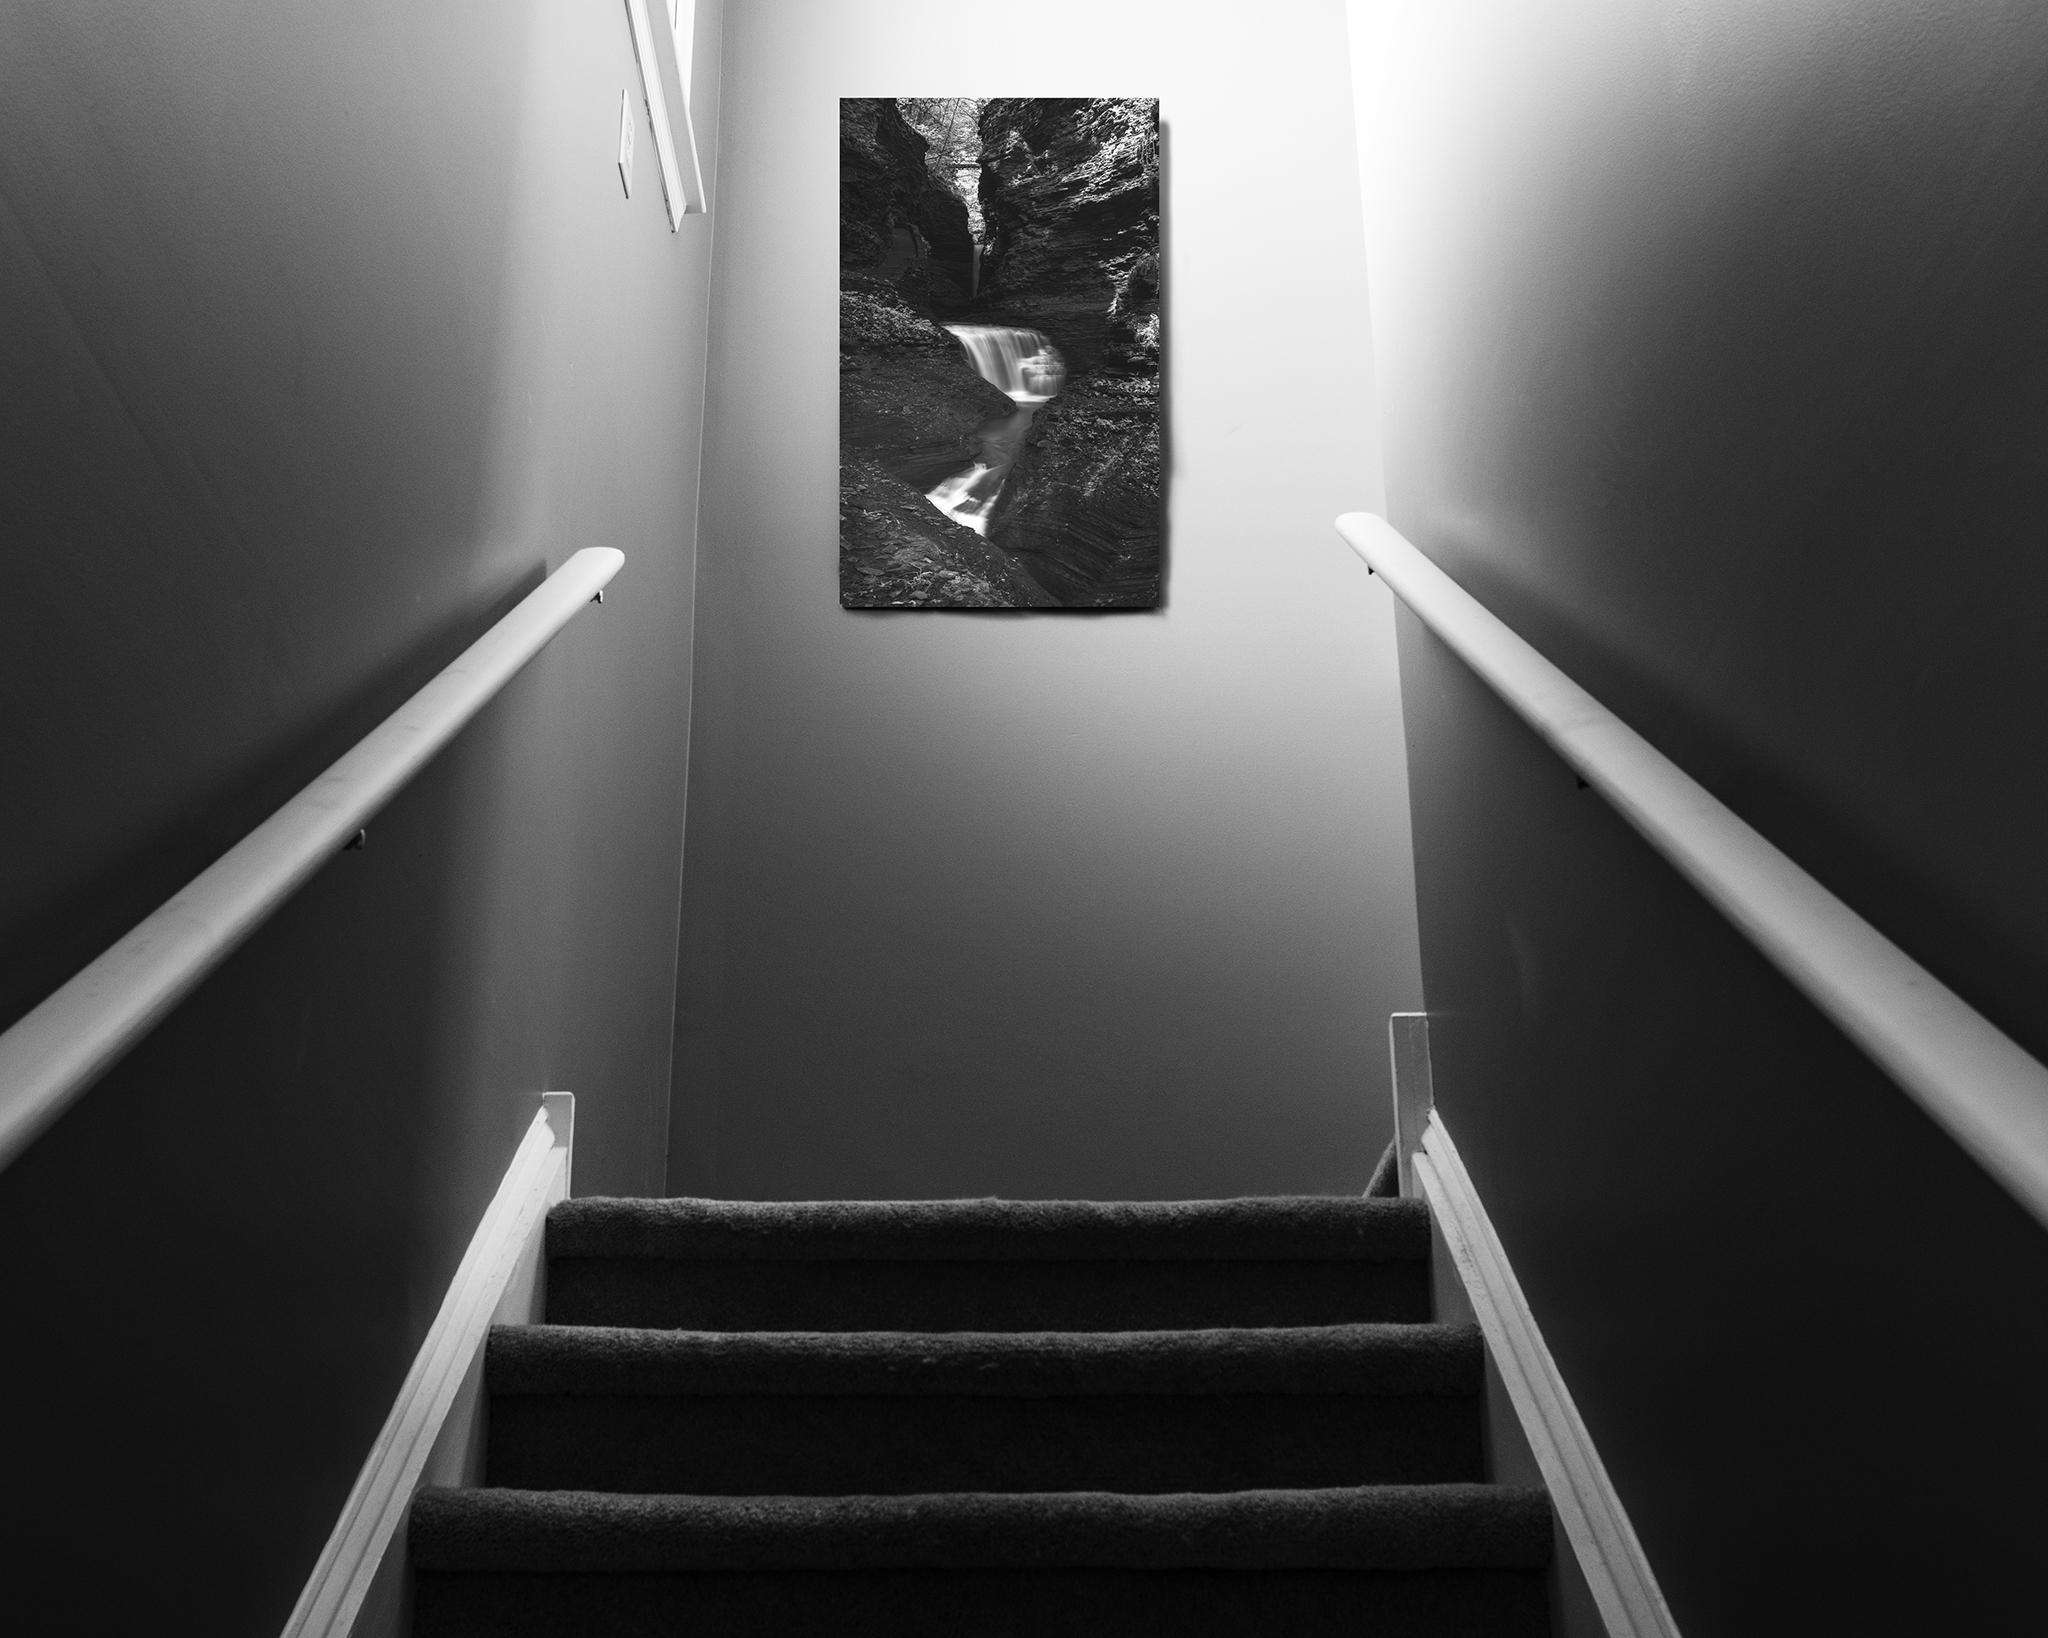 Apartment Stairs.jpg